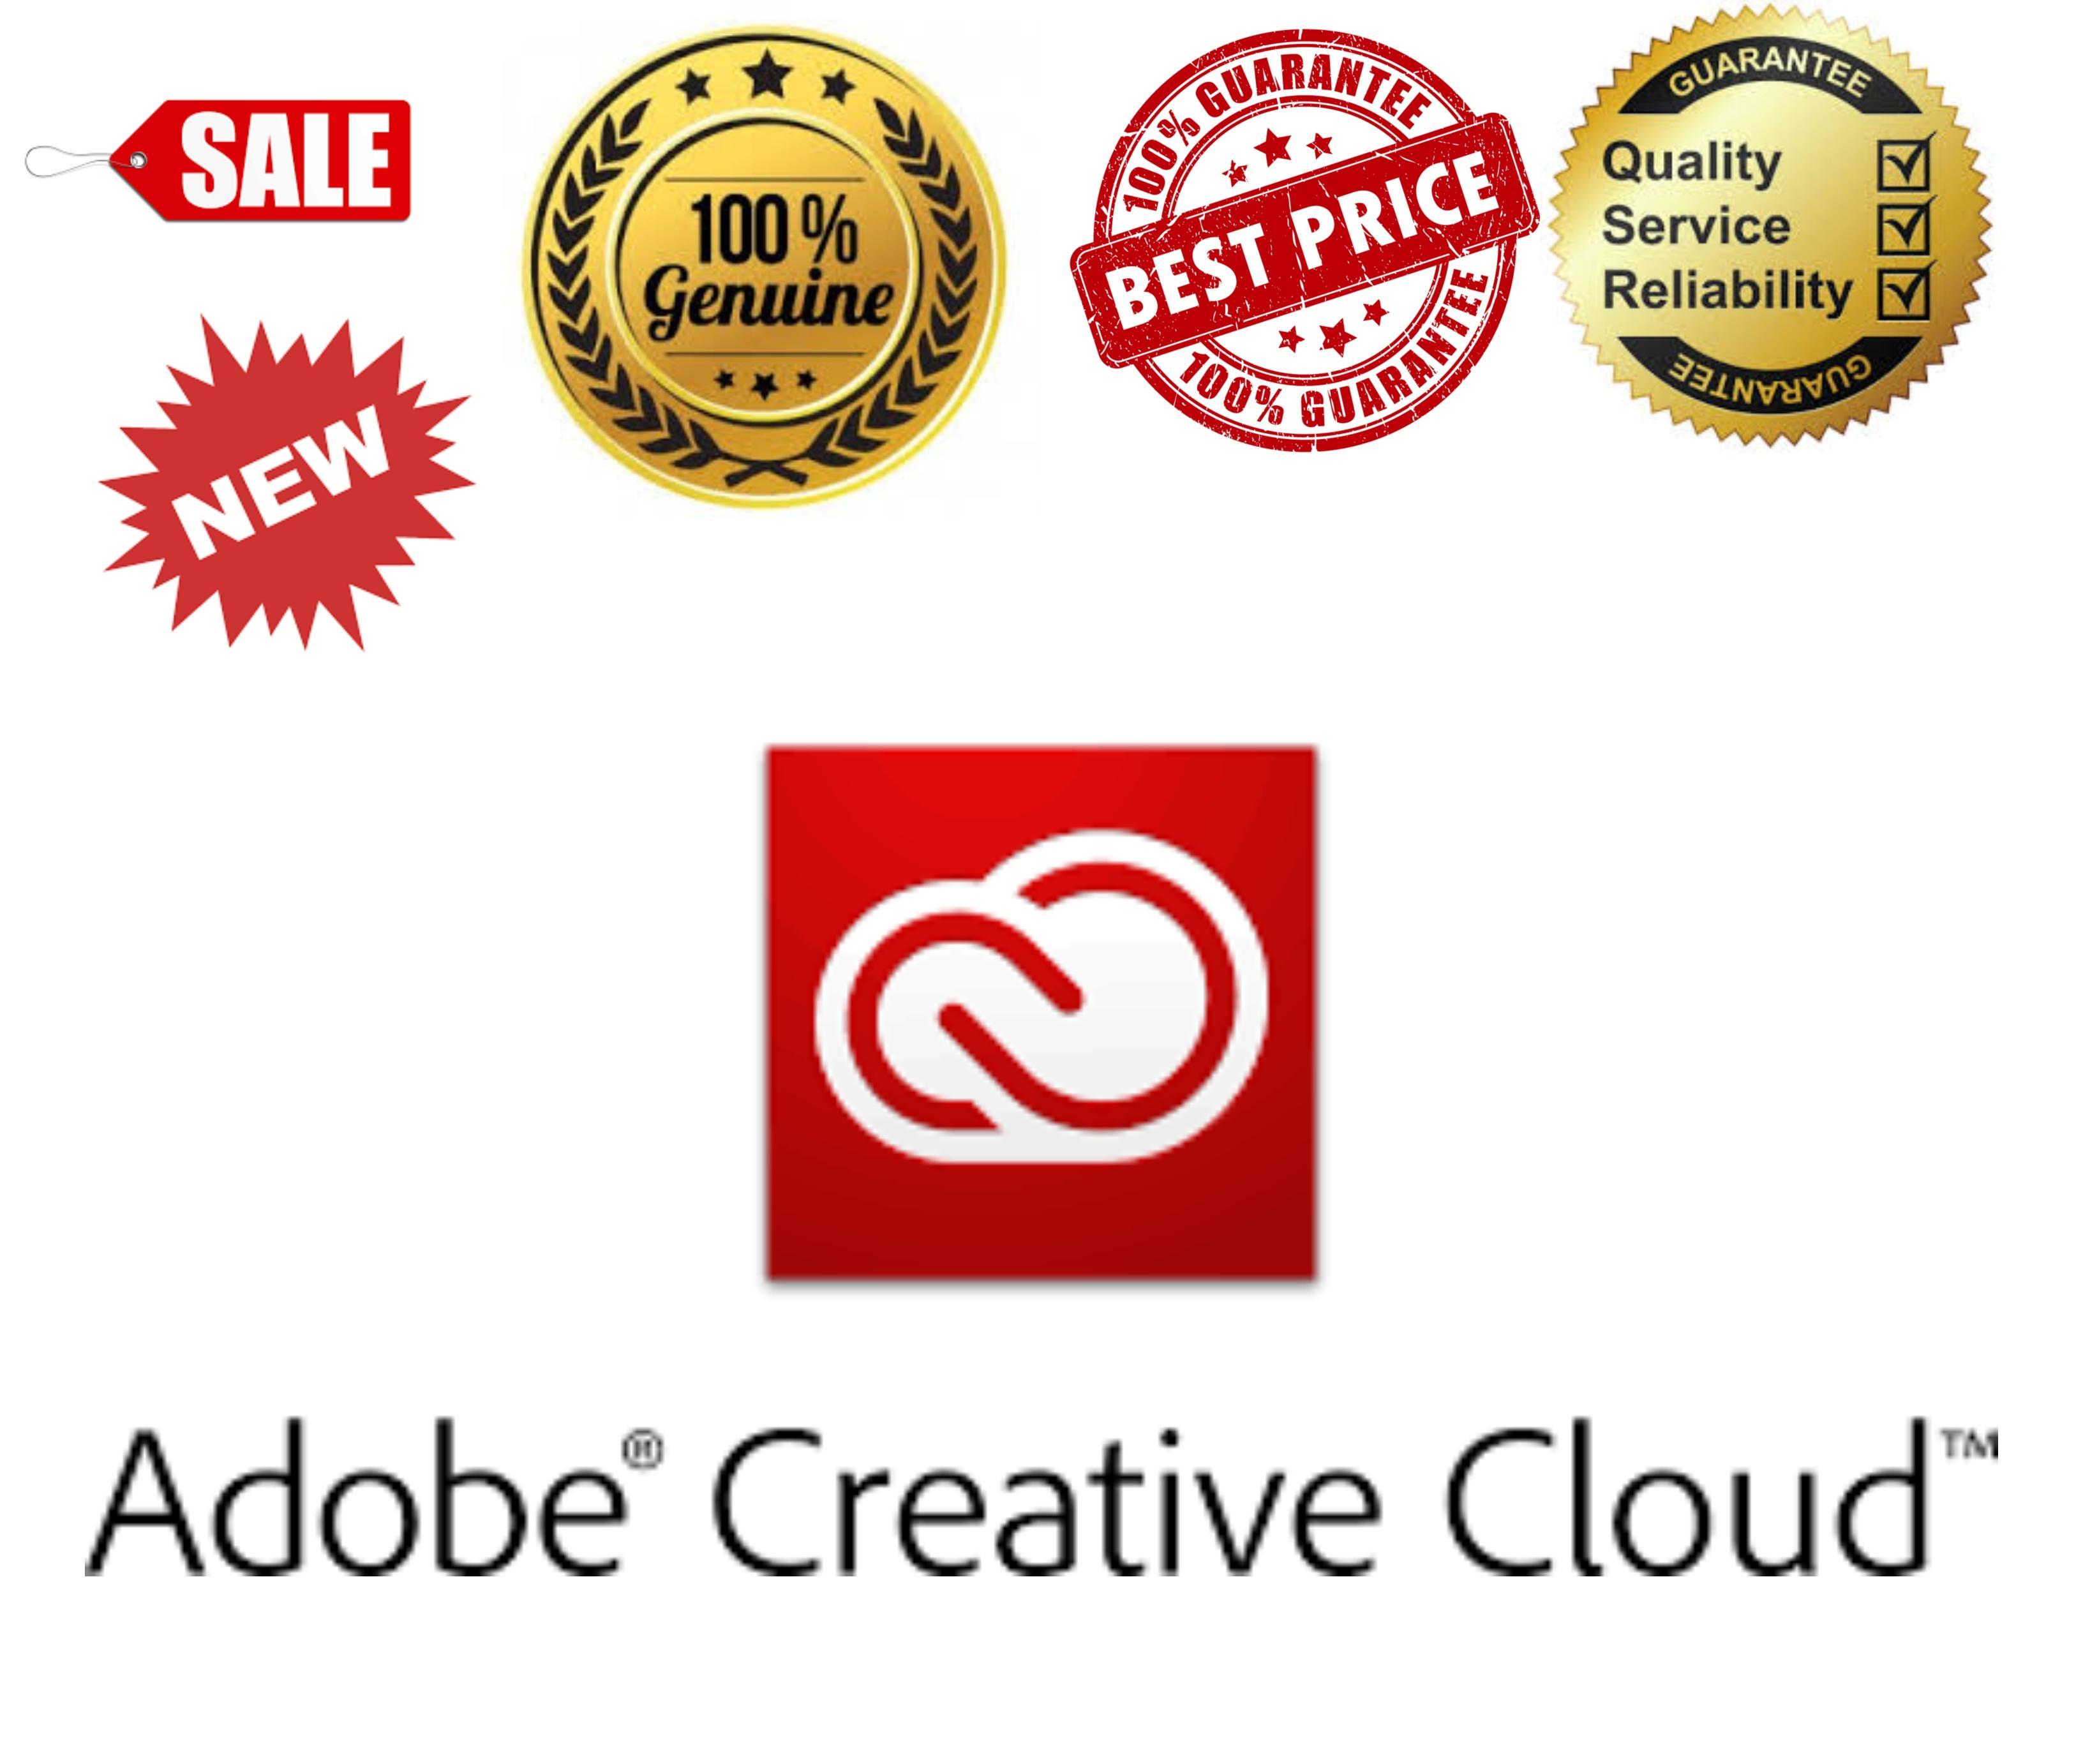 adobe photoshop installer for sale